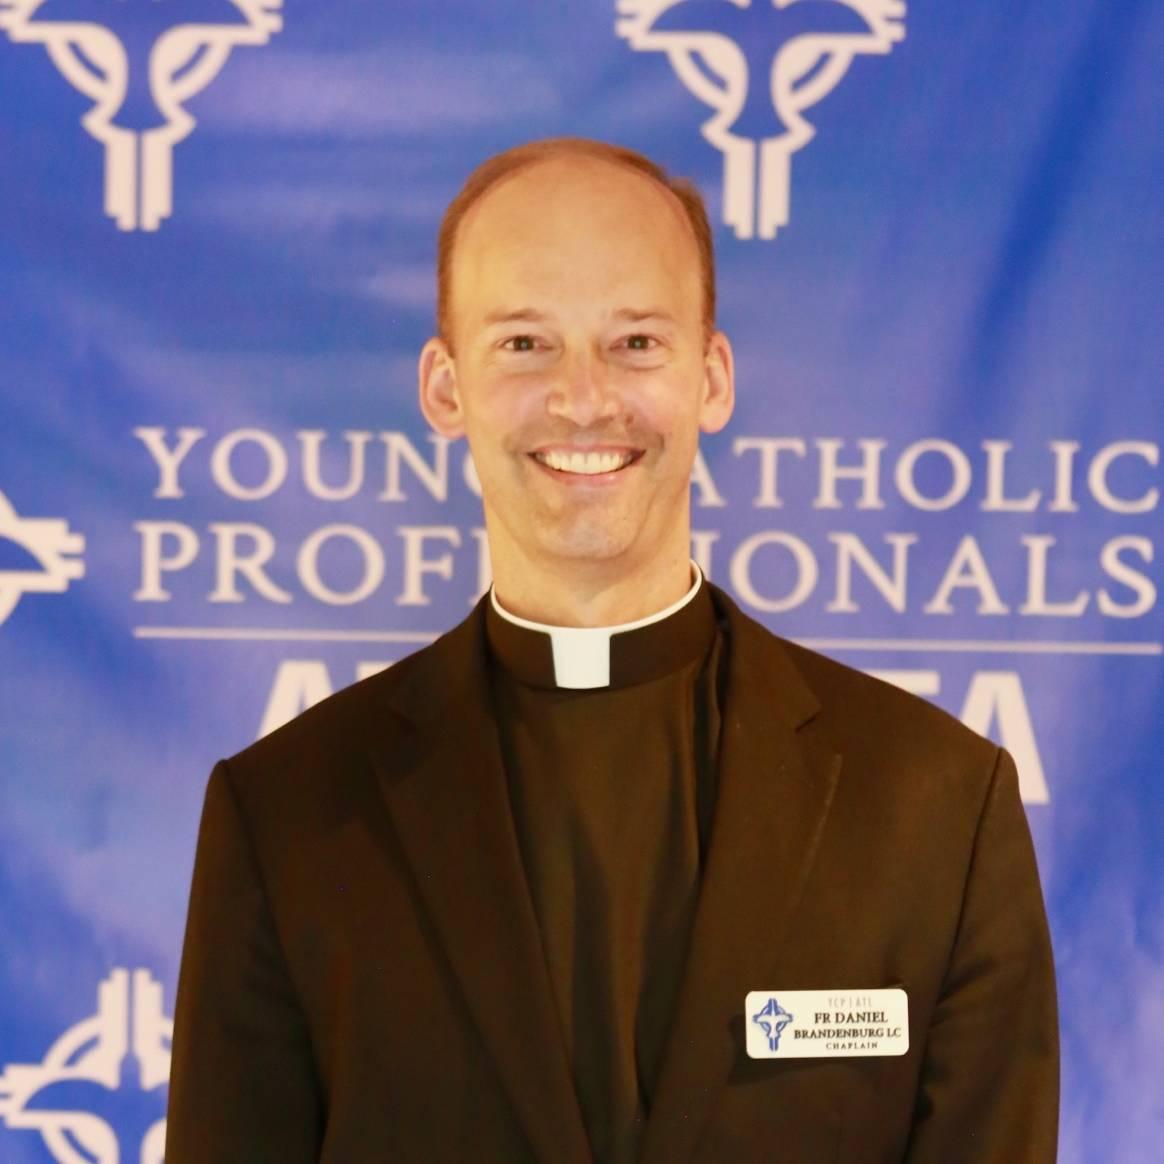 Fr. Daniel Brandenburg, LC - Chaplain